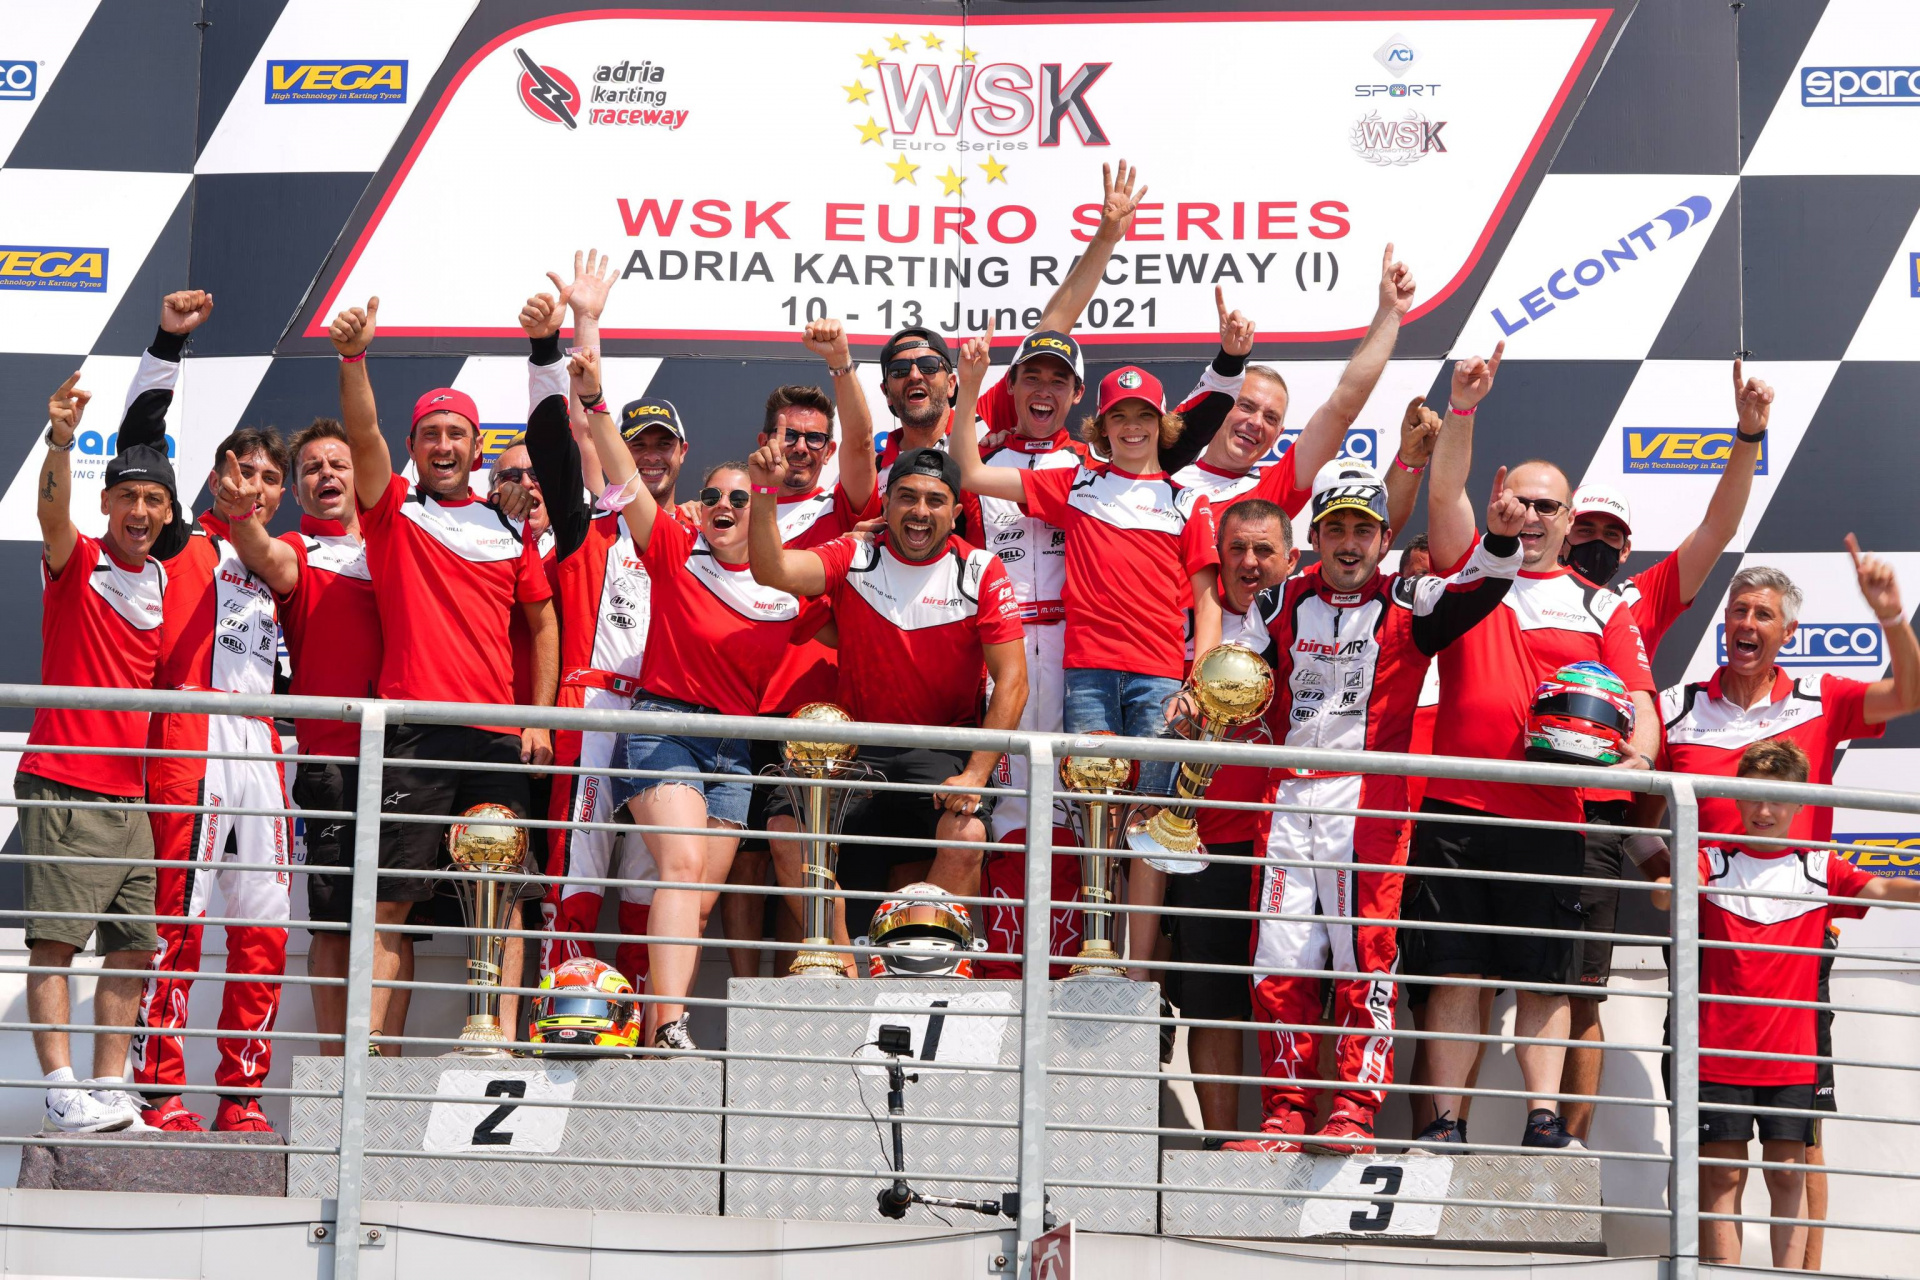 Red triumph in WSK at Adria